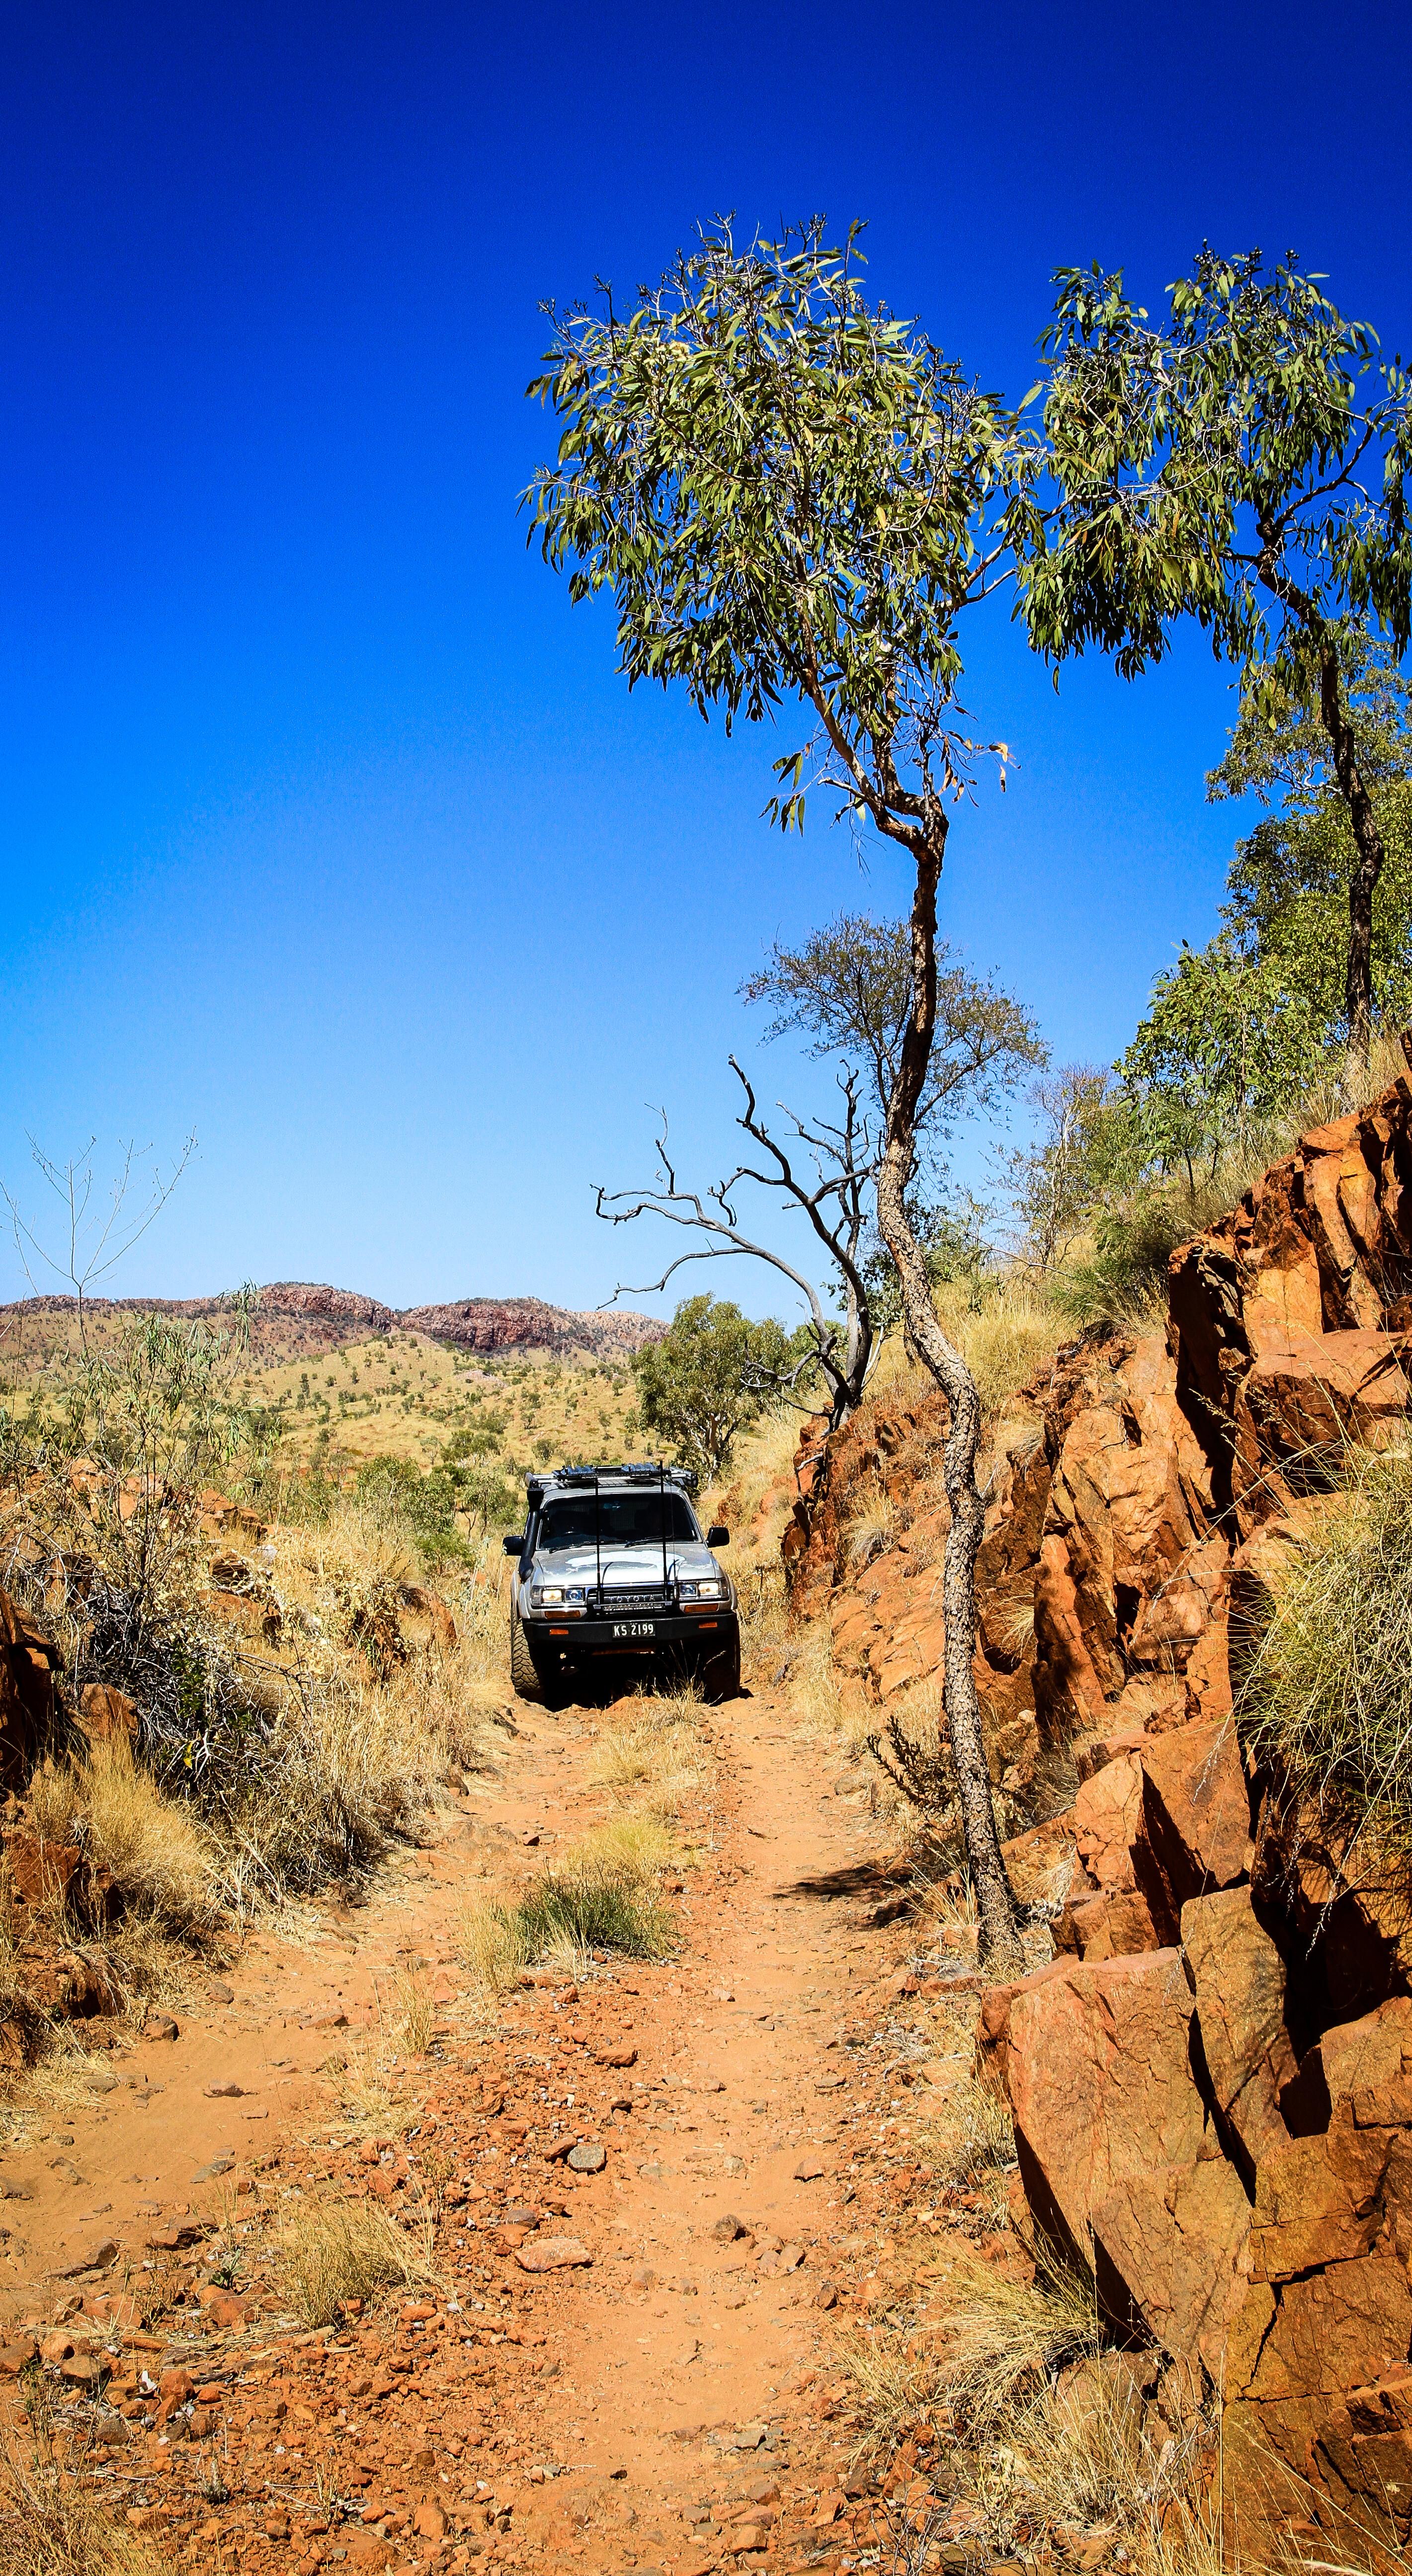 4 X 4 Australia Explore Mount Isa And Beyond 24